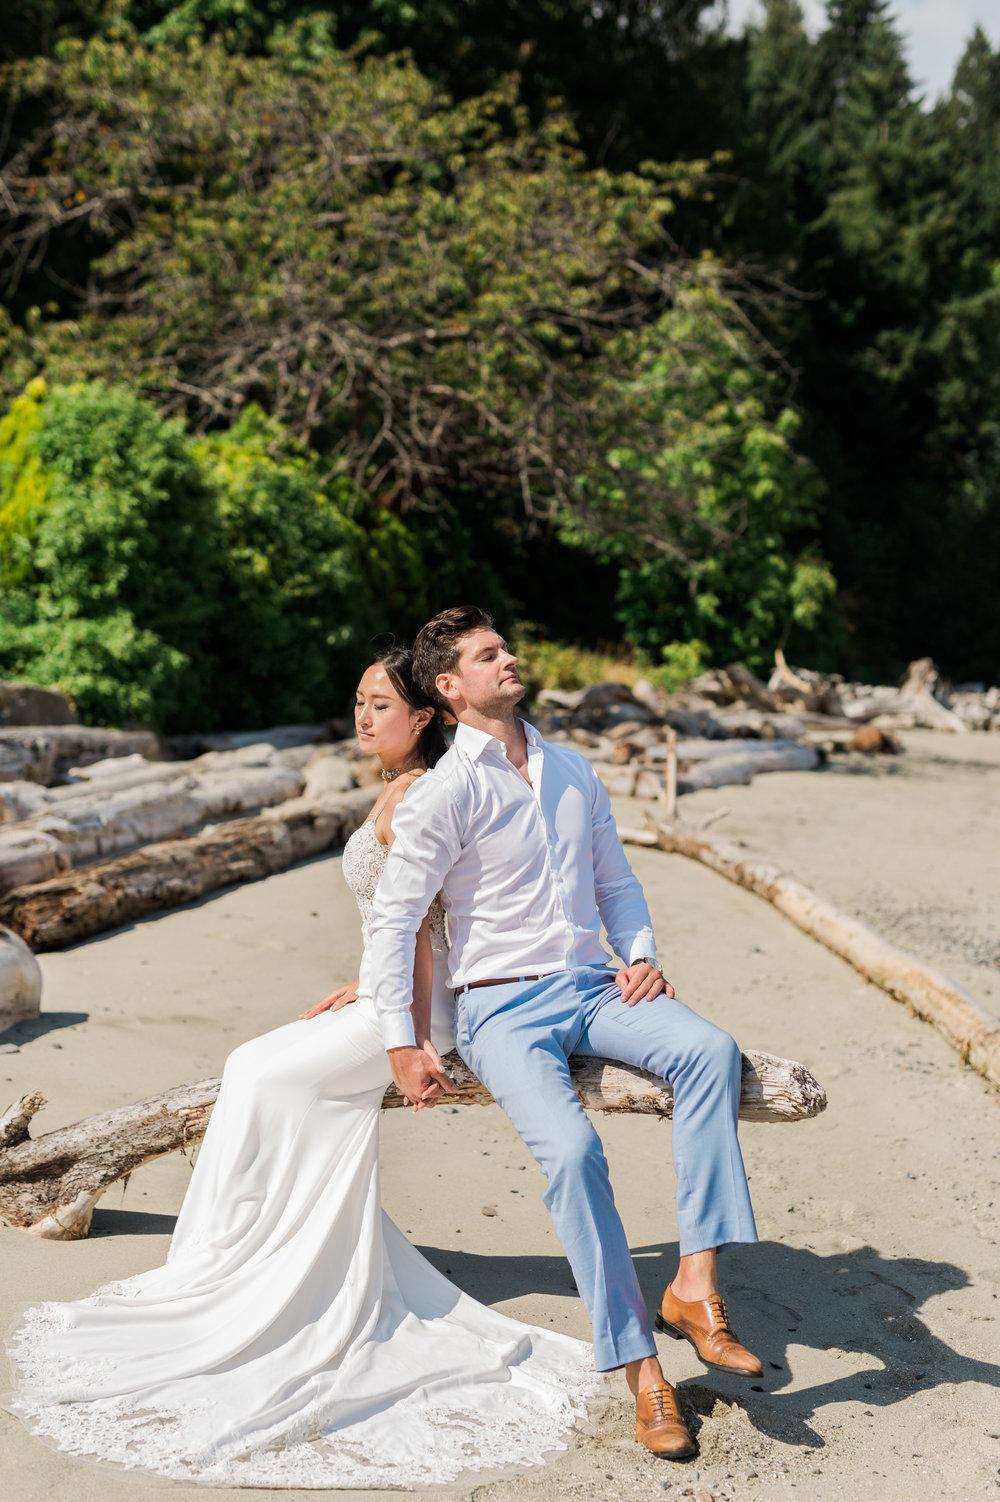 Gibsons Wedding Photos - Sunshine Coast Wedding Photos - Vancouver Wedding Photographer & Videographer - Sunshine Coast Wedding Photos - Sunshine Coast Wedding Photographer - Jennifer Picard Photography - IMG_9984.jpg